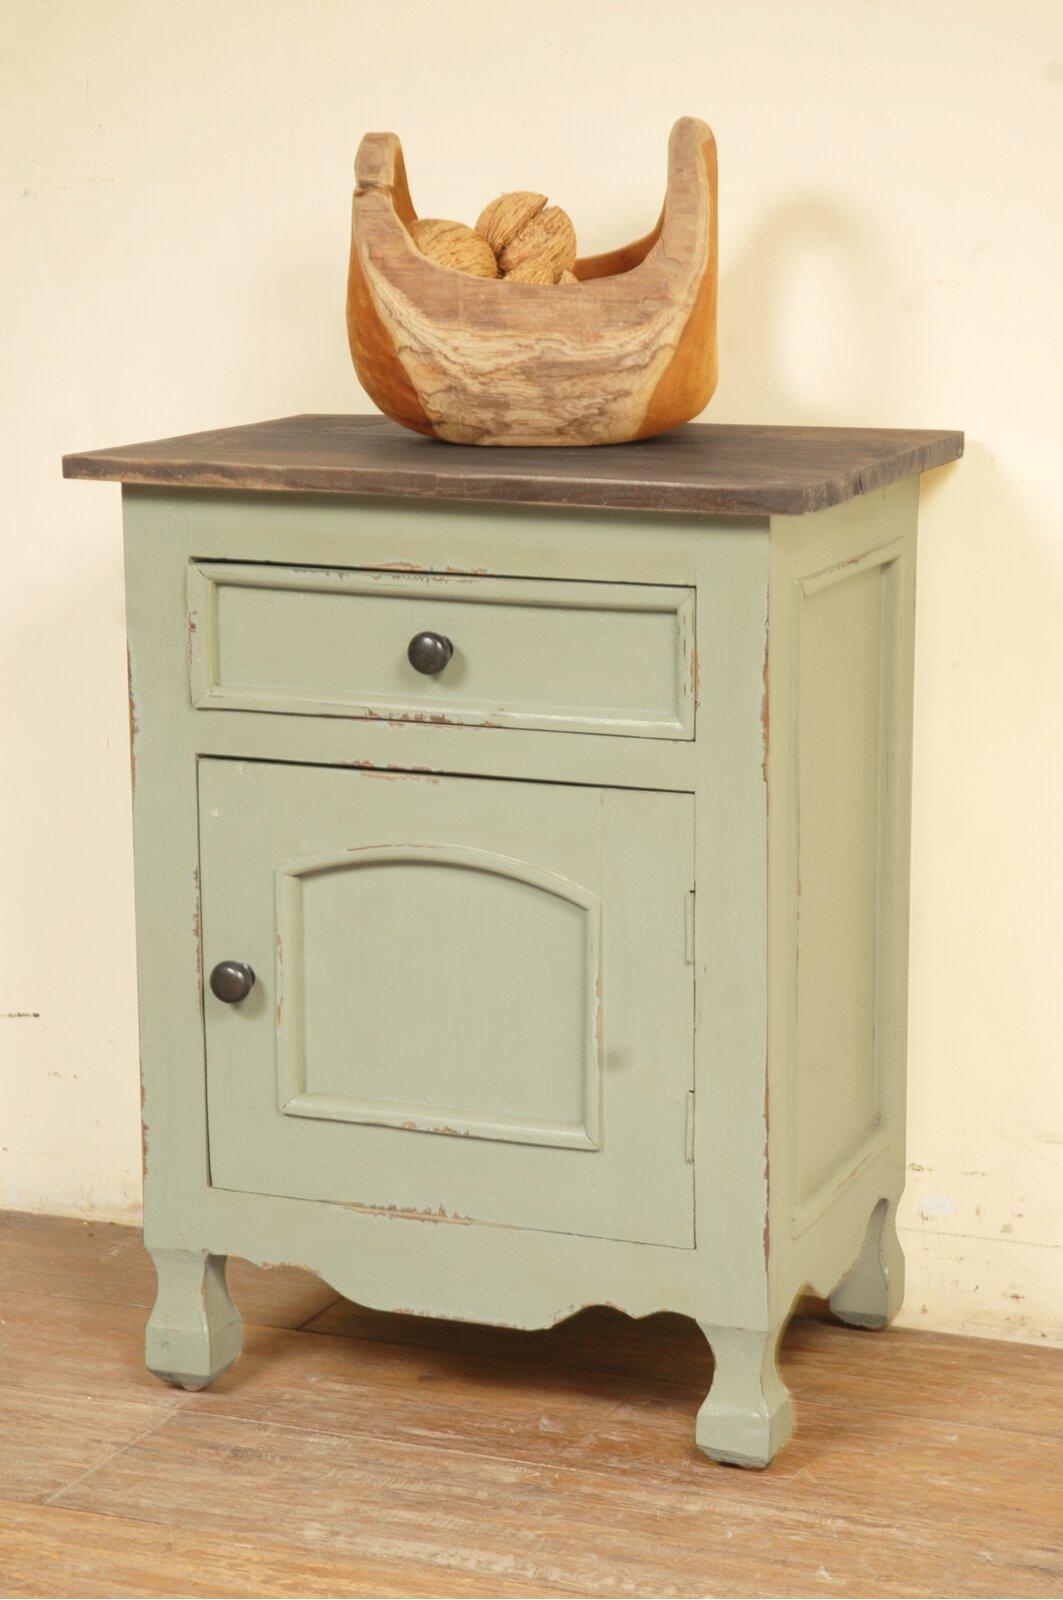 handmade wooden cabinet